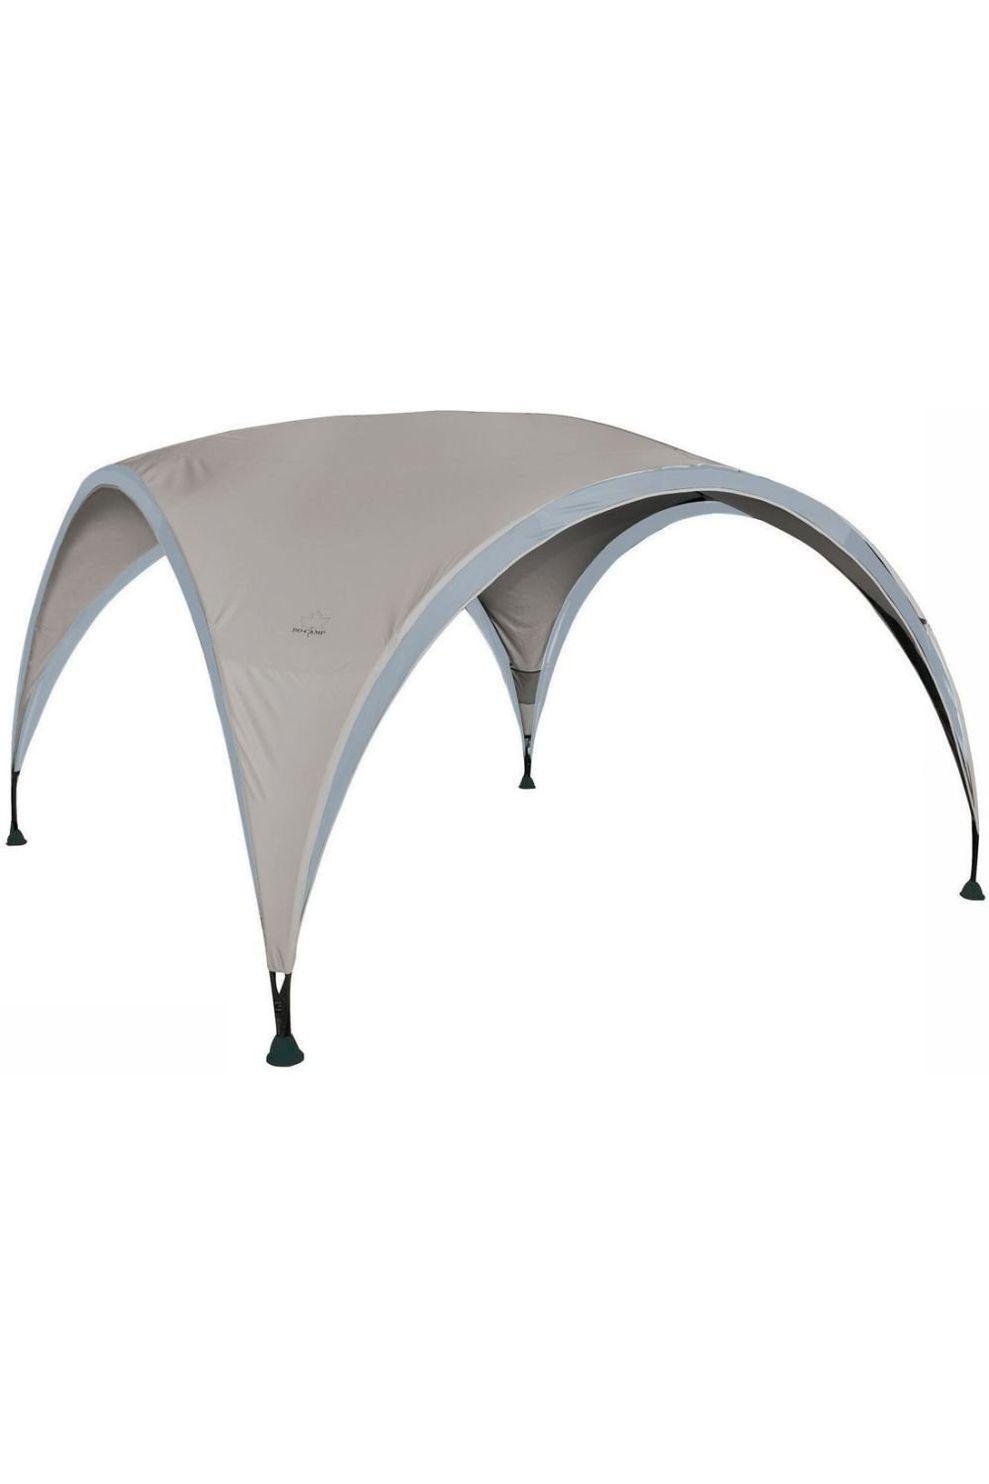 Bo-Garden Tarps Party Shelter Partytent Medium 3,7X3,7X2,39 Meter - - Transparant